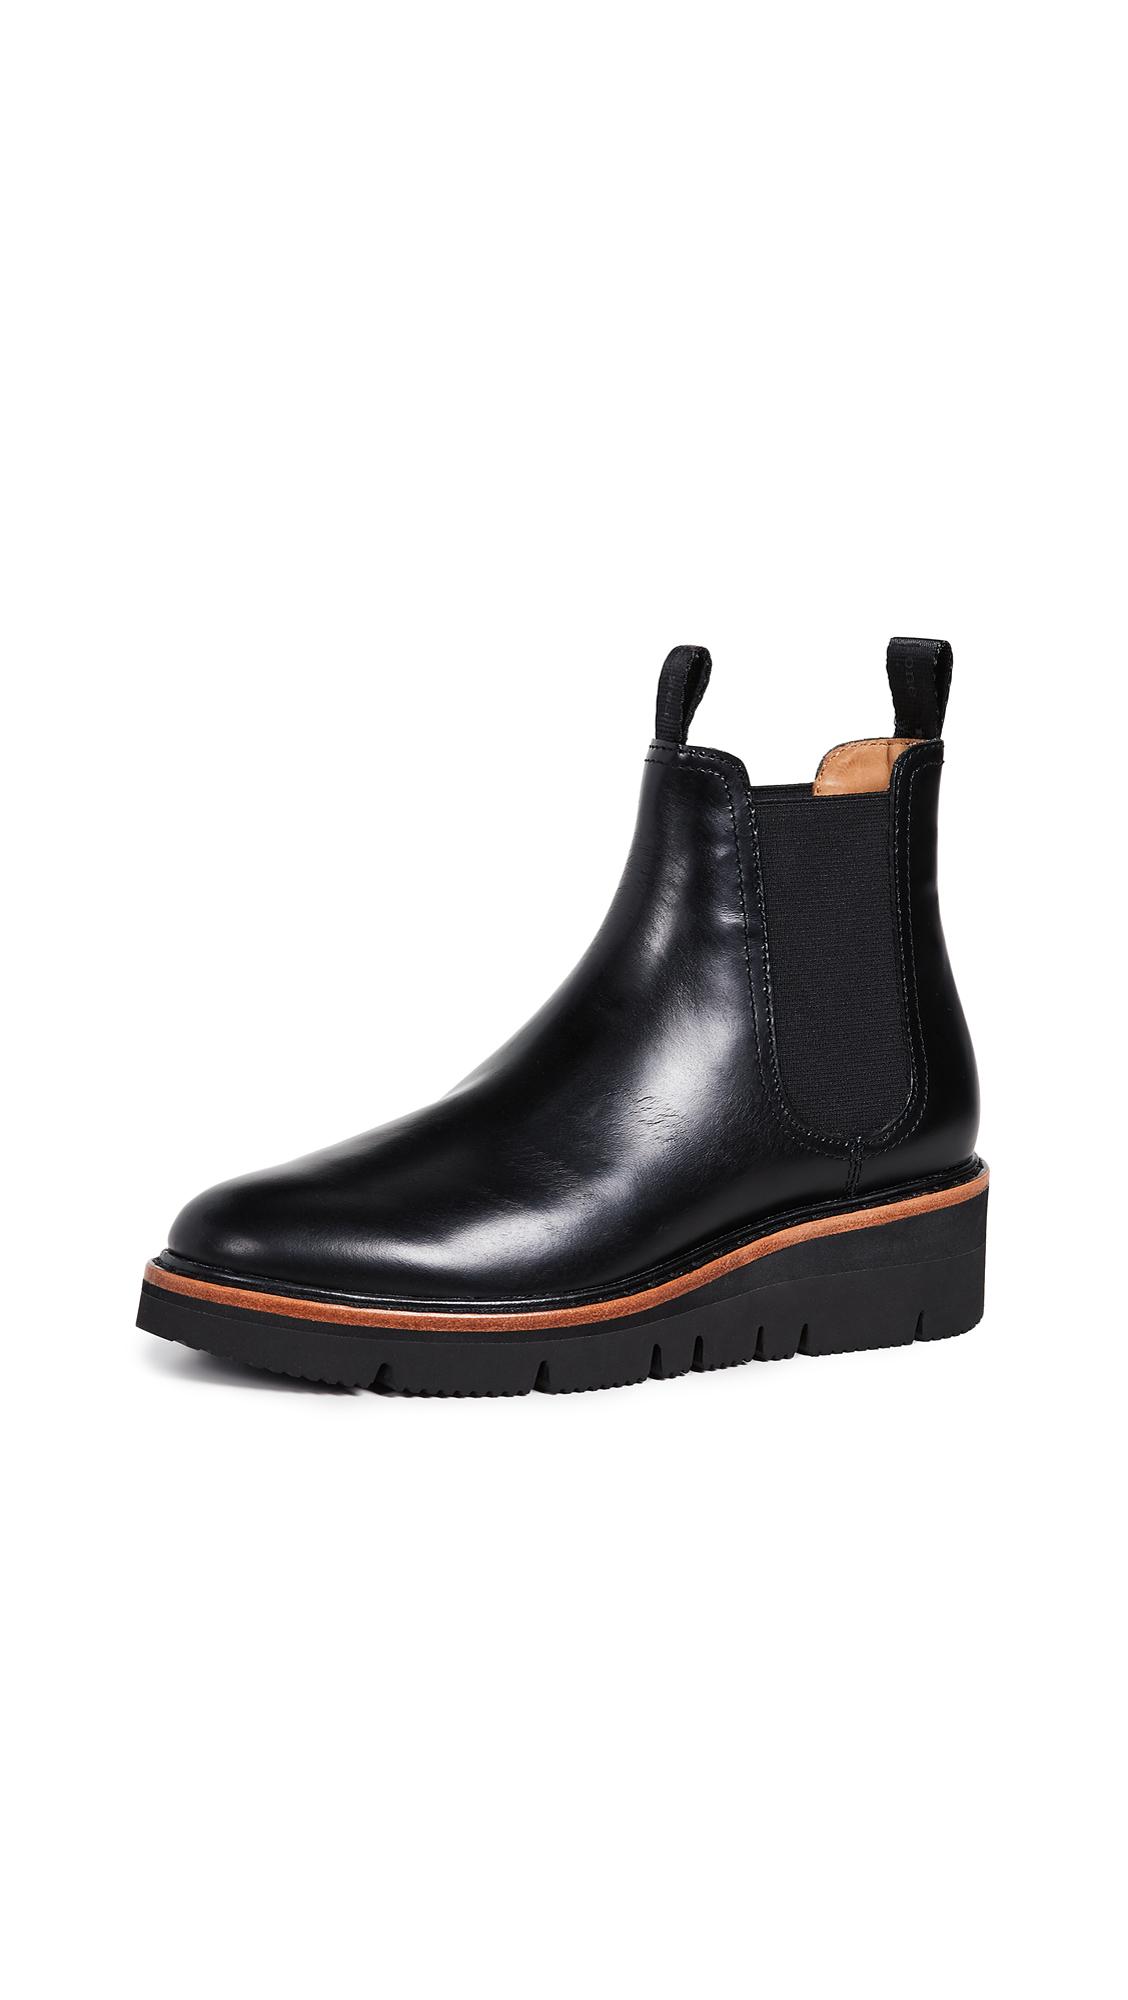 Rag & Bone Taryn Chelsea Boots - Black